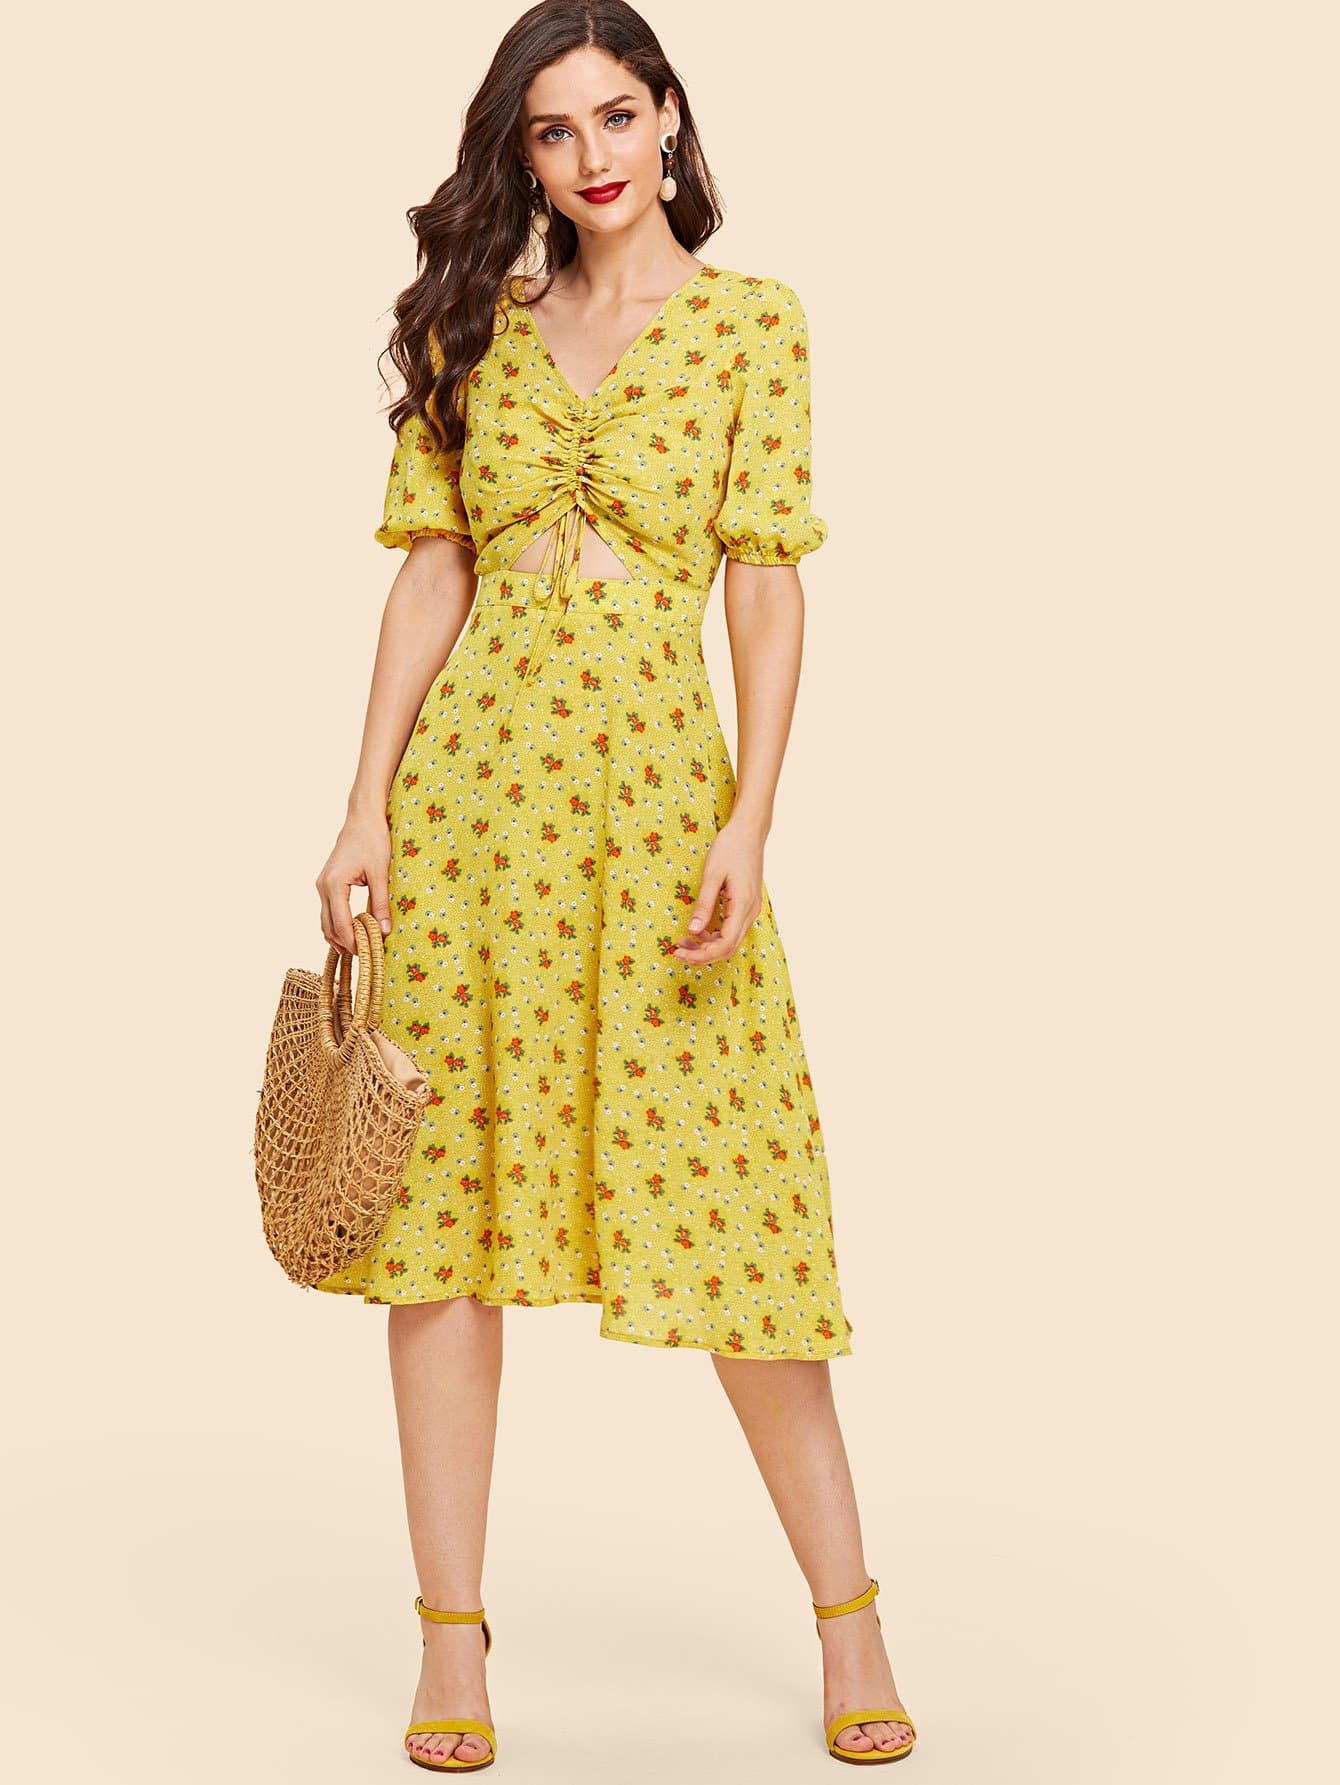 Drawstring Front Cutout Midriff Ditsy Dress knot front cutout midriff halterneck gingham dress